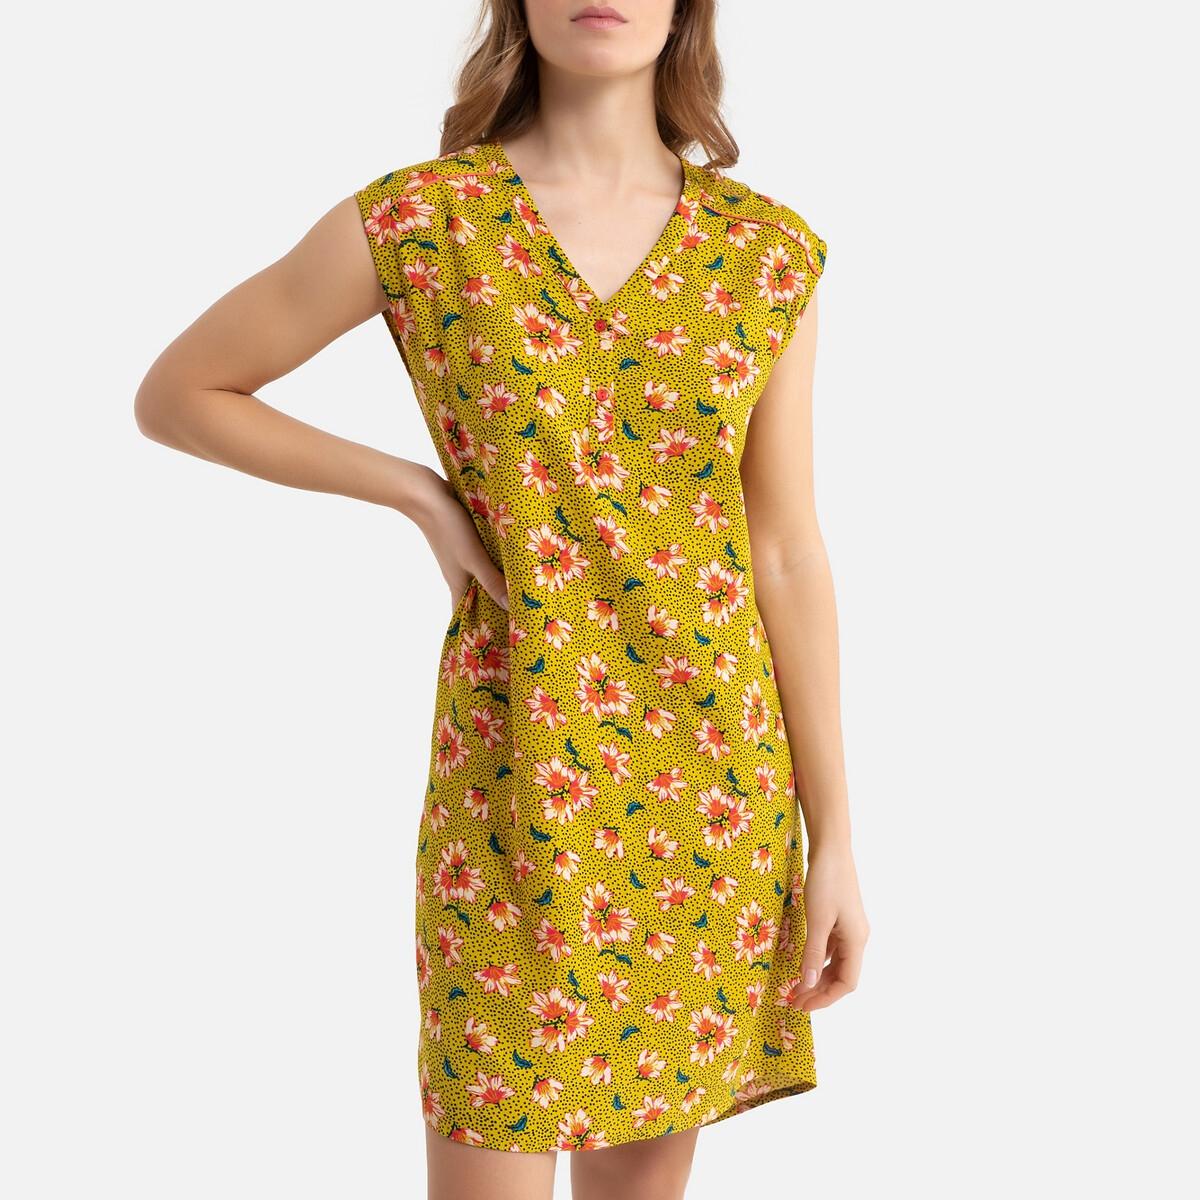 Camisa de dormir estampada às flores